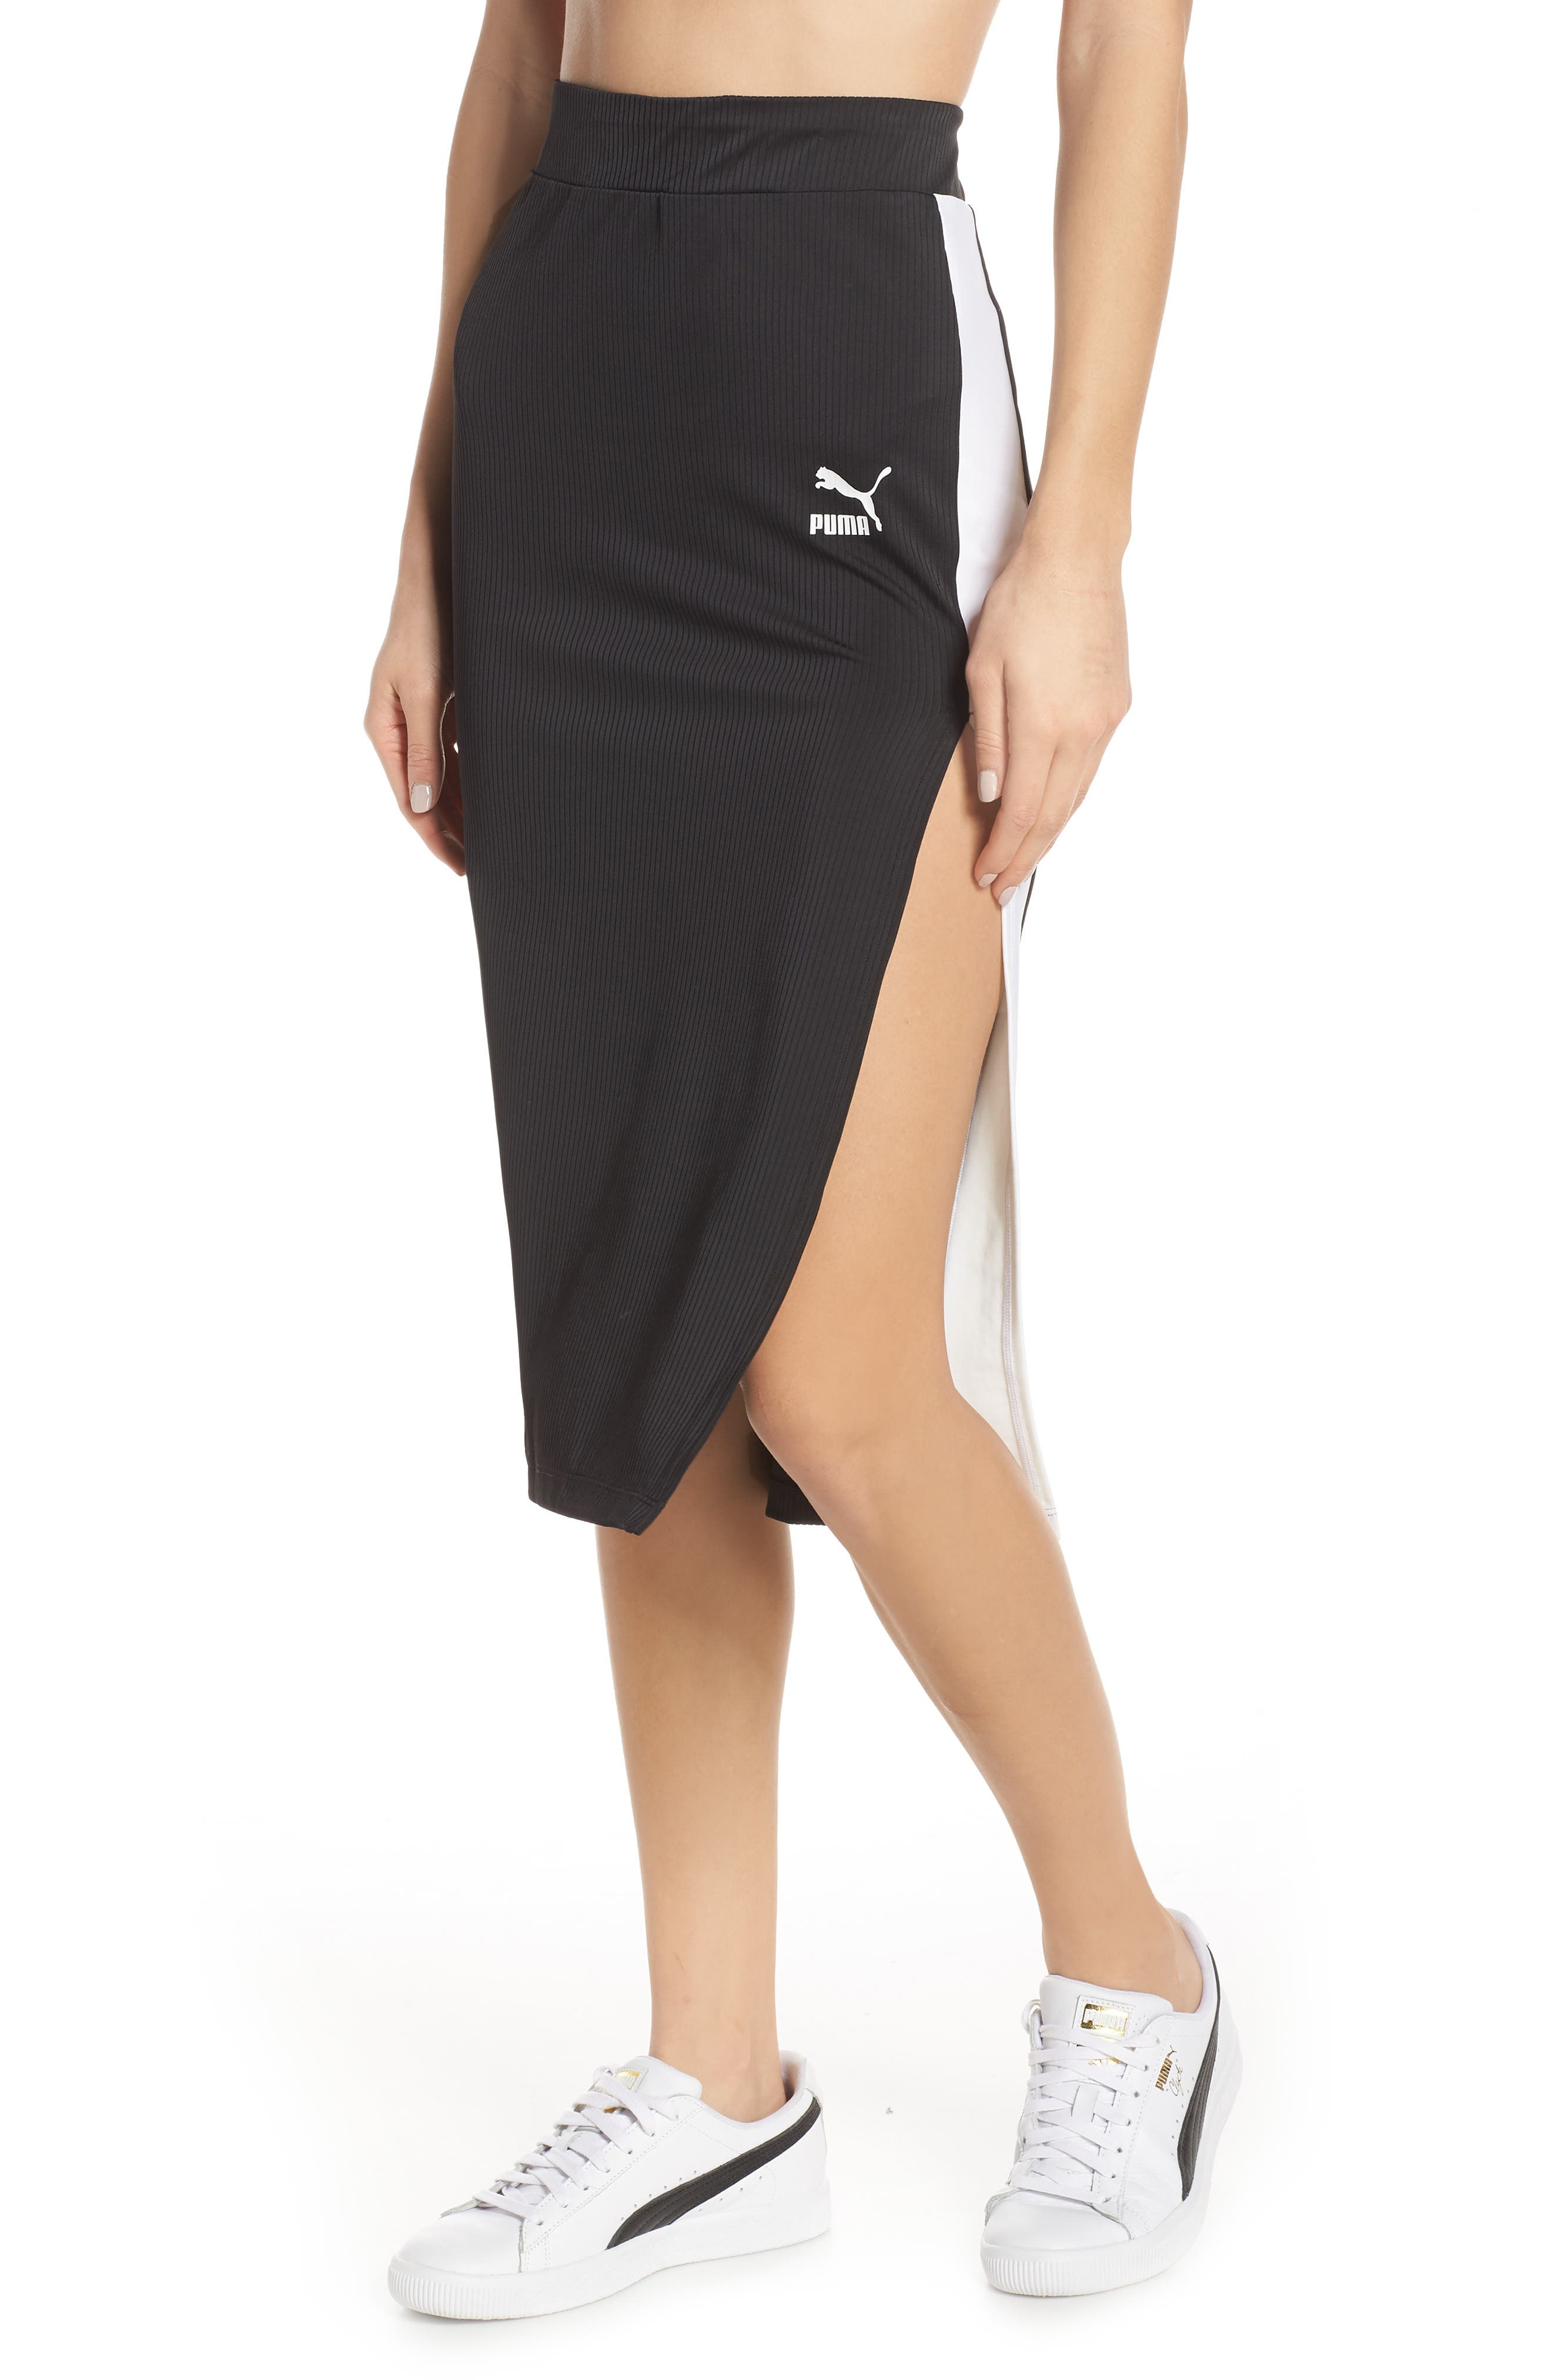 PUMA Classics Ribbed Skirt, Main, color, 001